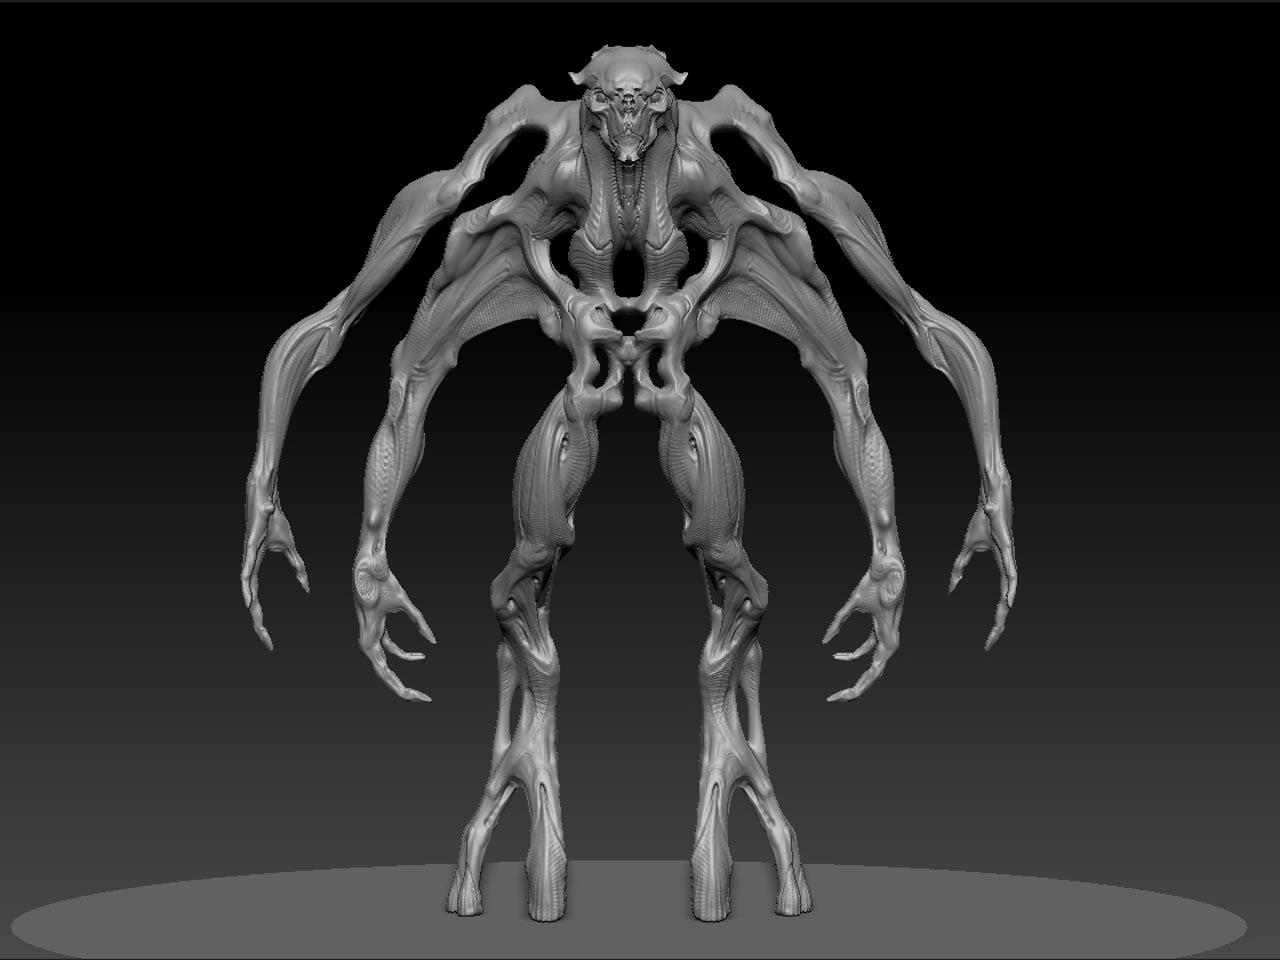 Super 8 Monster | www.pixshark.com - Images Galleries With ...